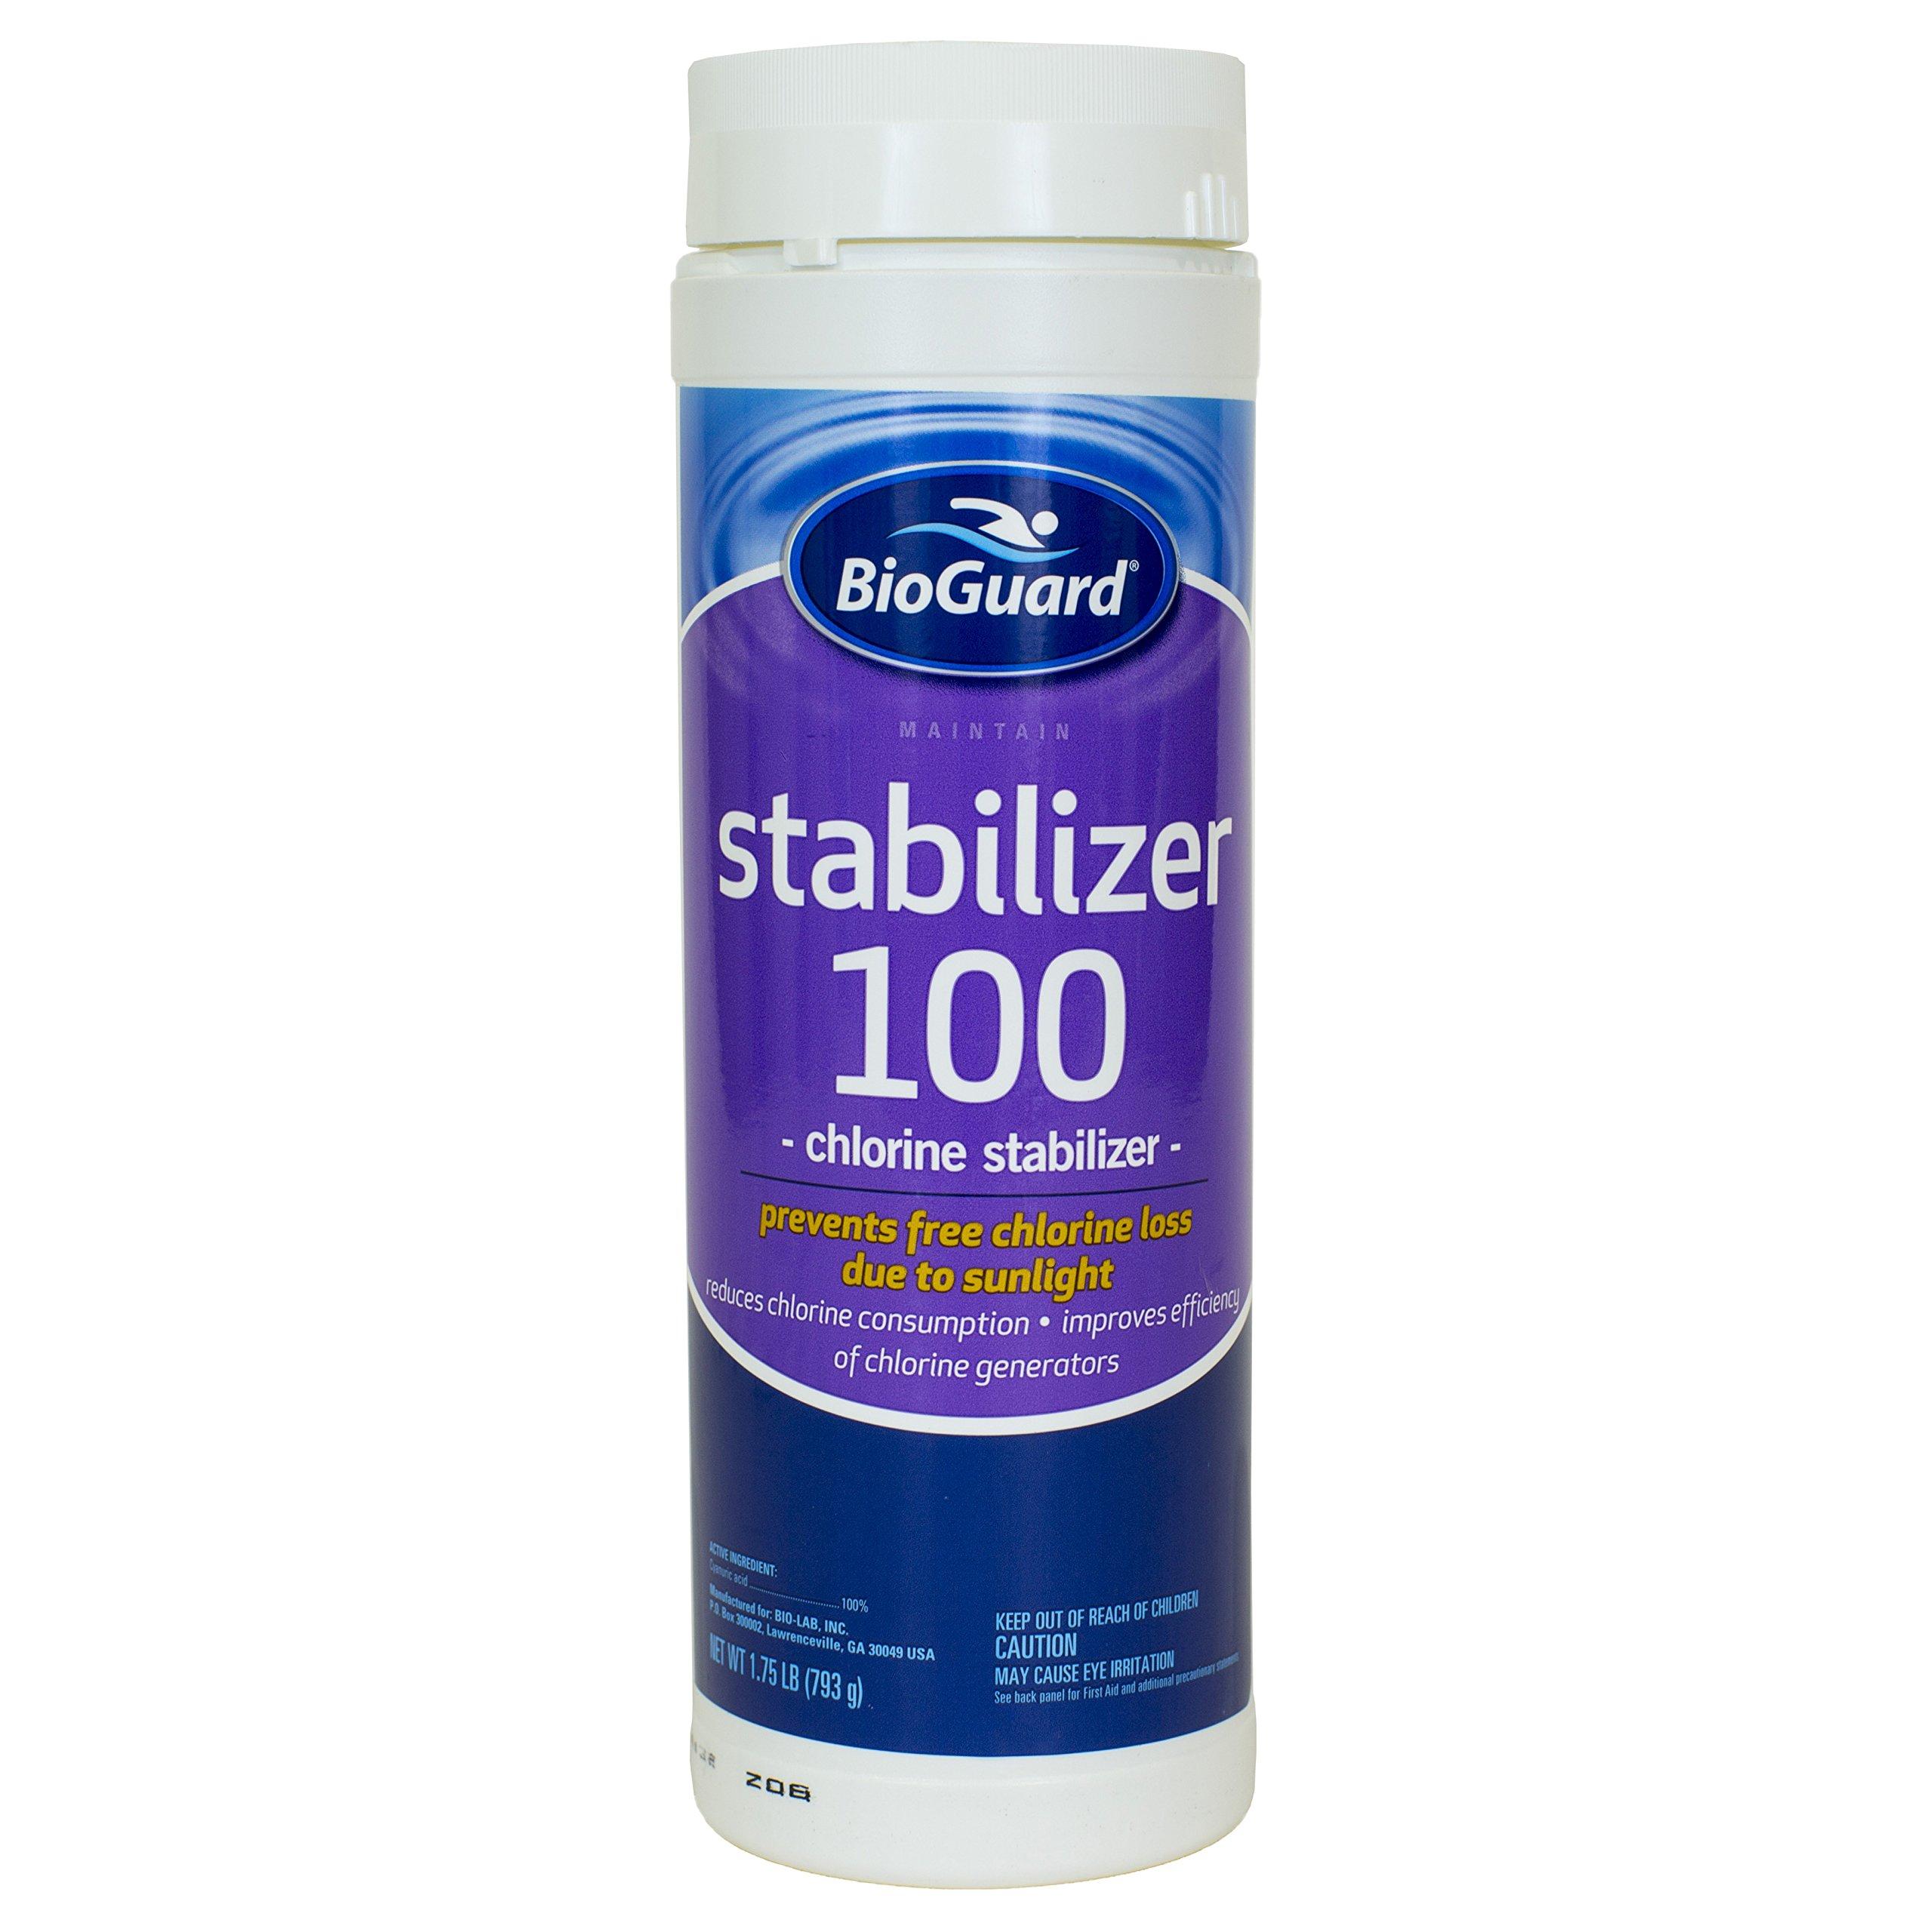 BioGuard Stabilizer 100 - 1.75 Lb.